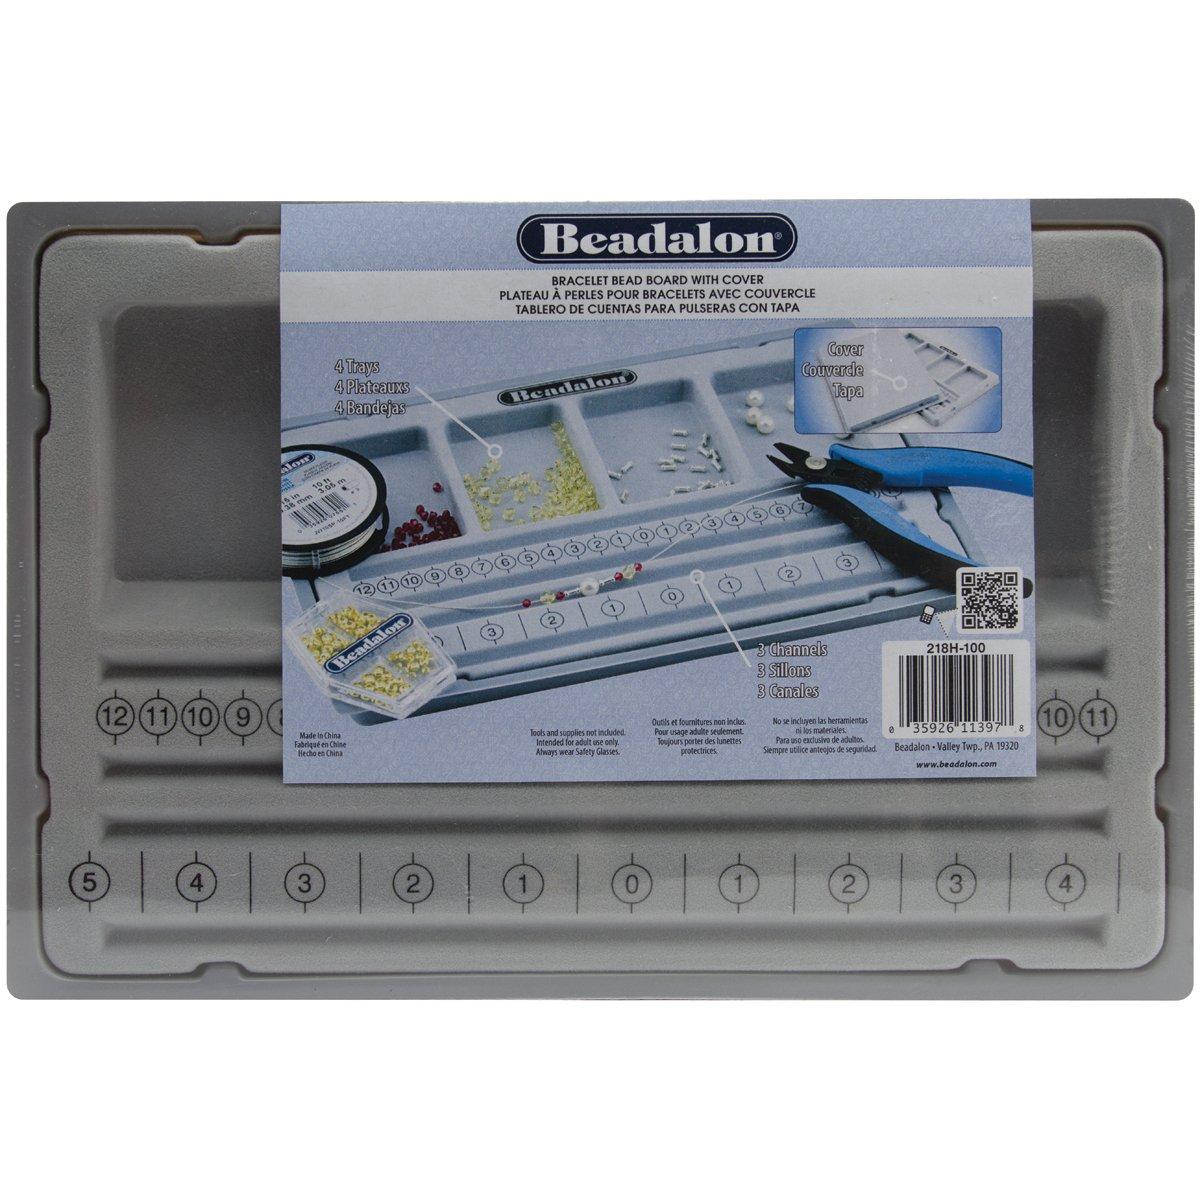 Beadalon 218H-100 Bracelet Bead Board with Cover